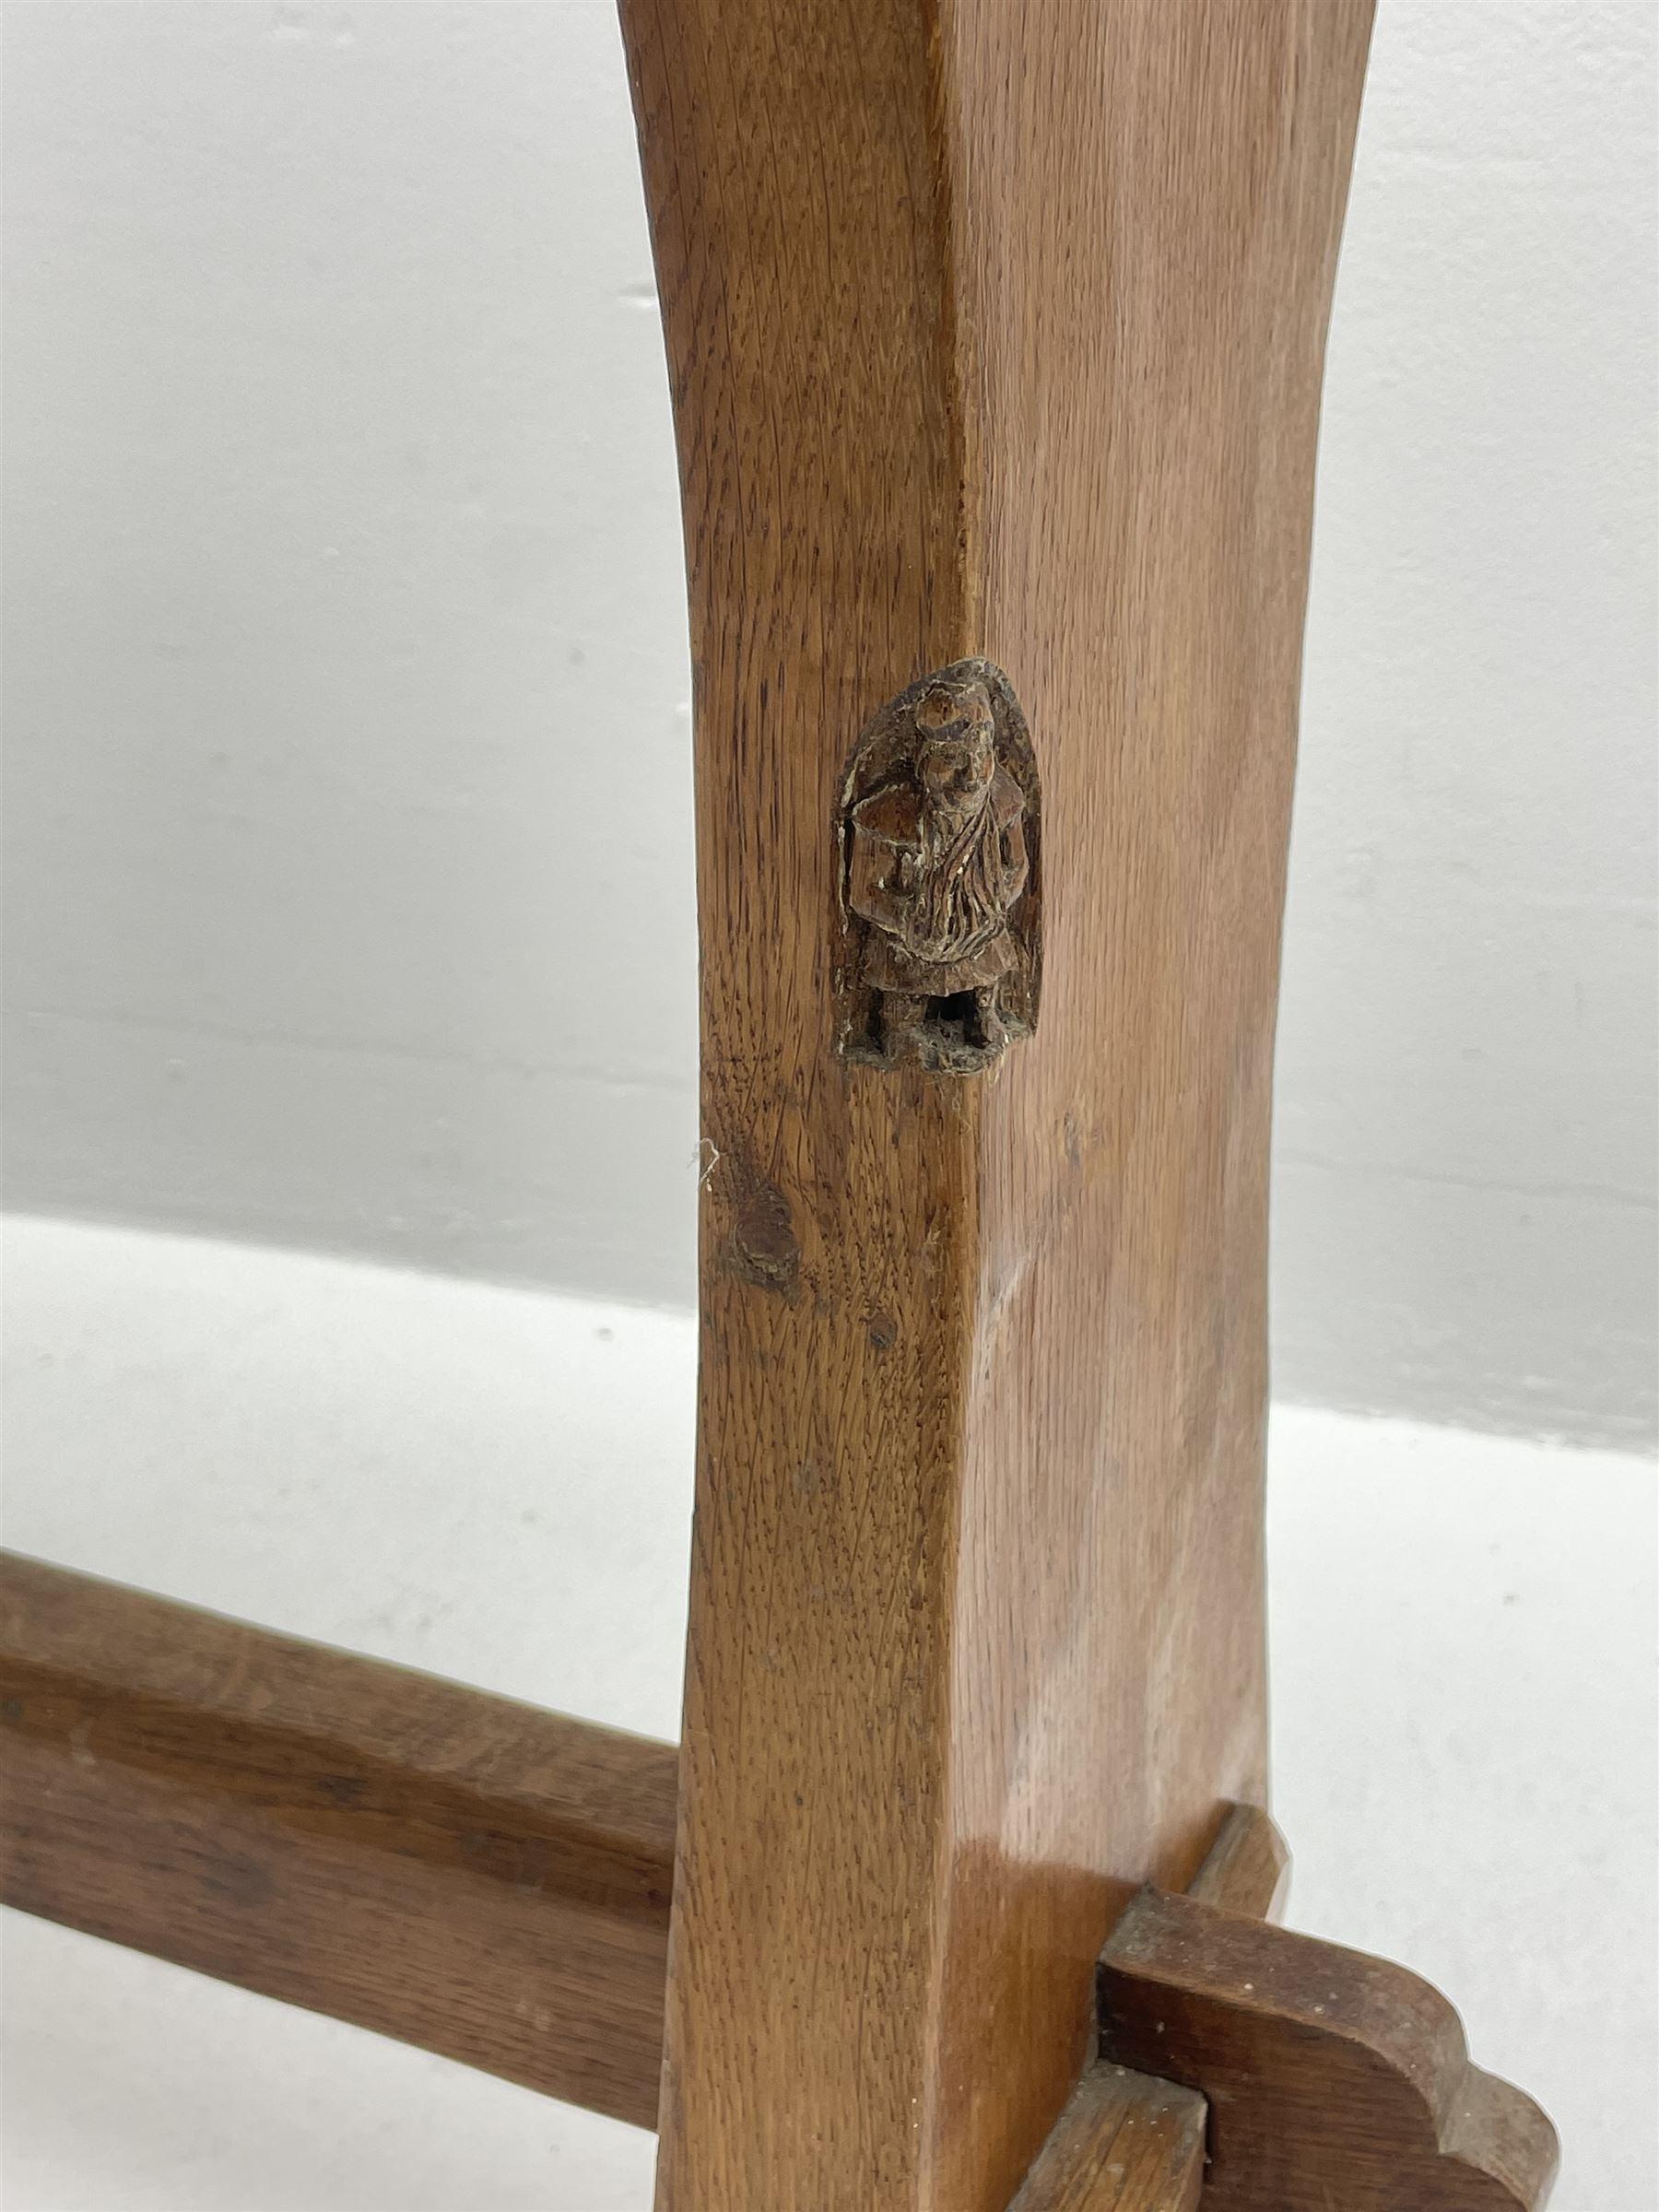 'Gnomeman' adzed oak side table - Image 2 of 4